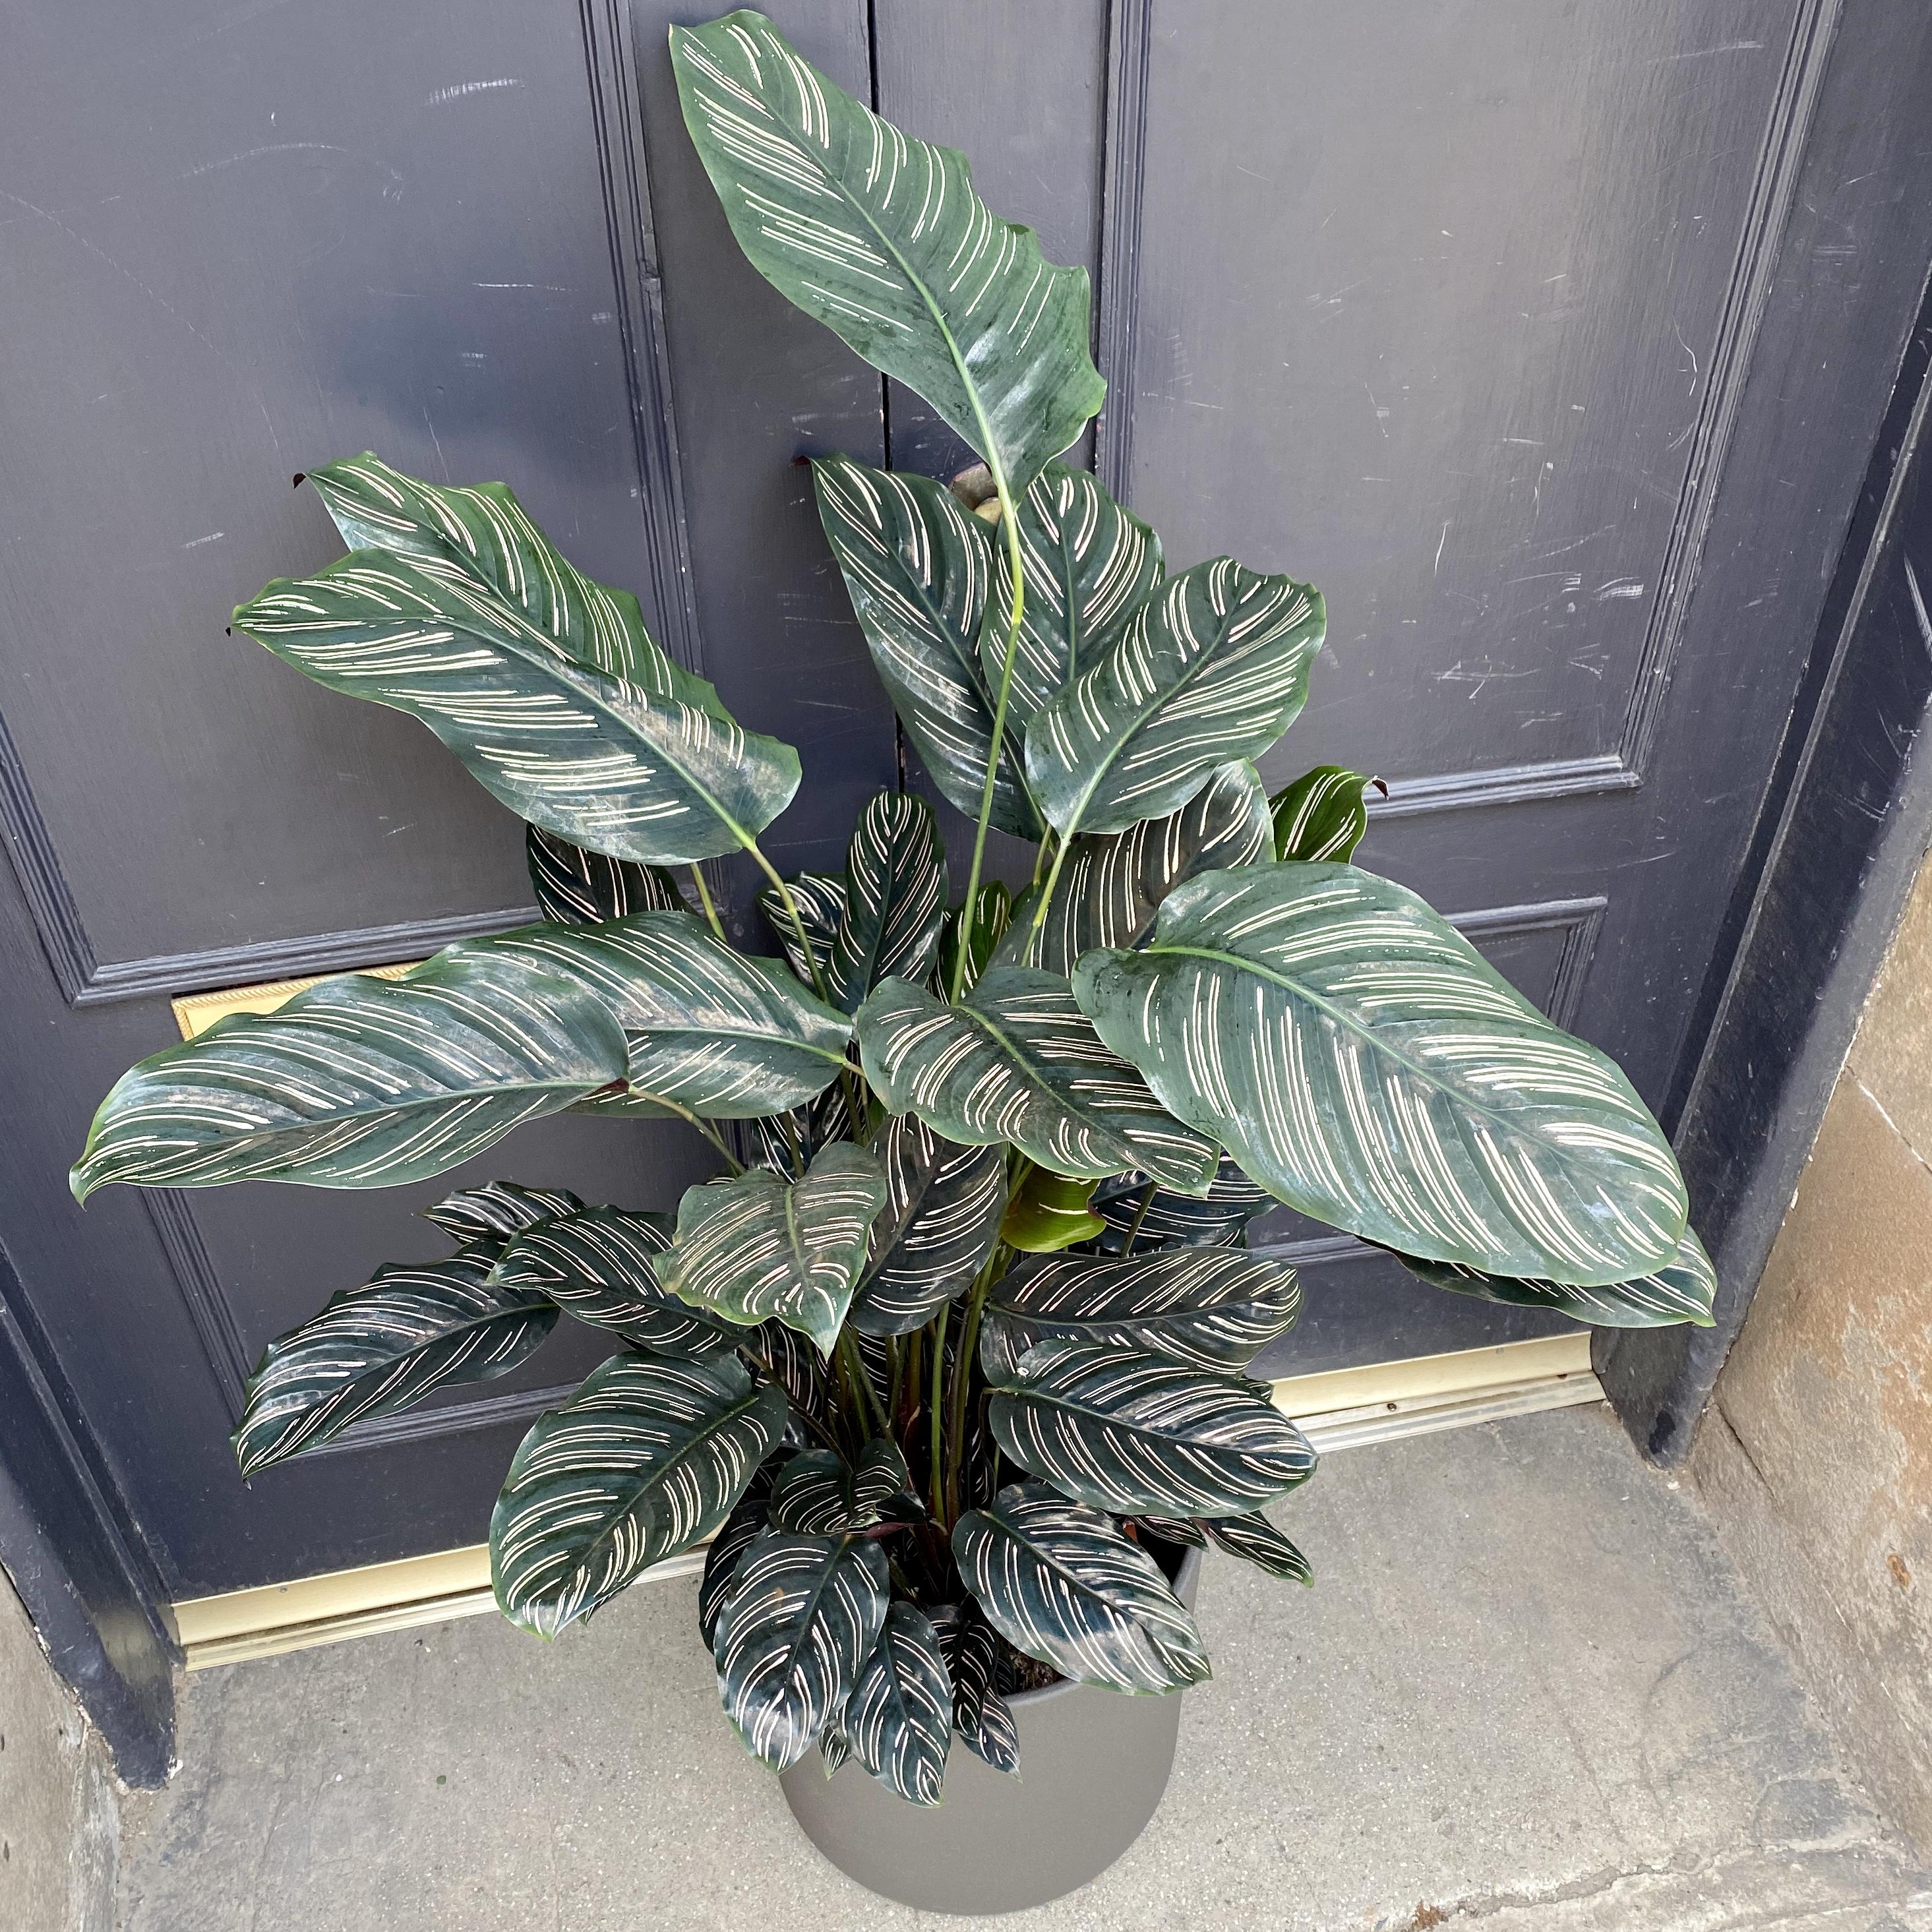 Calathea ornata (27cm pot)